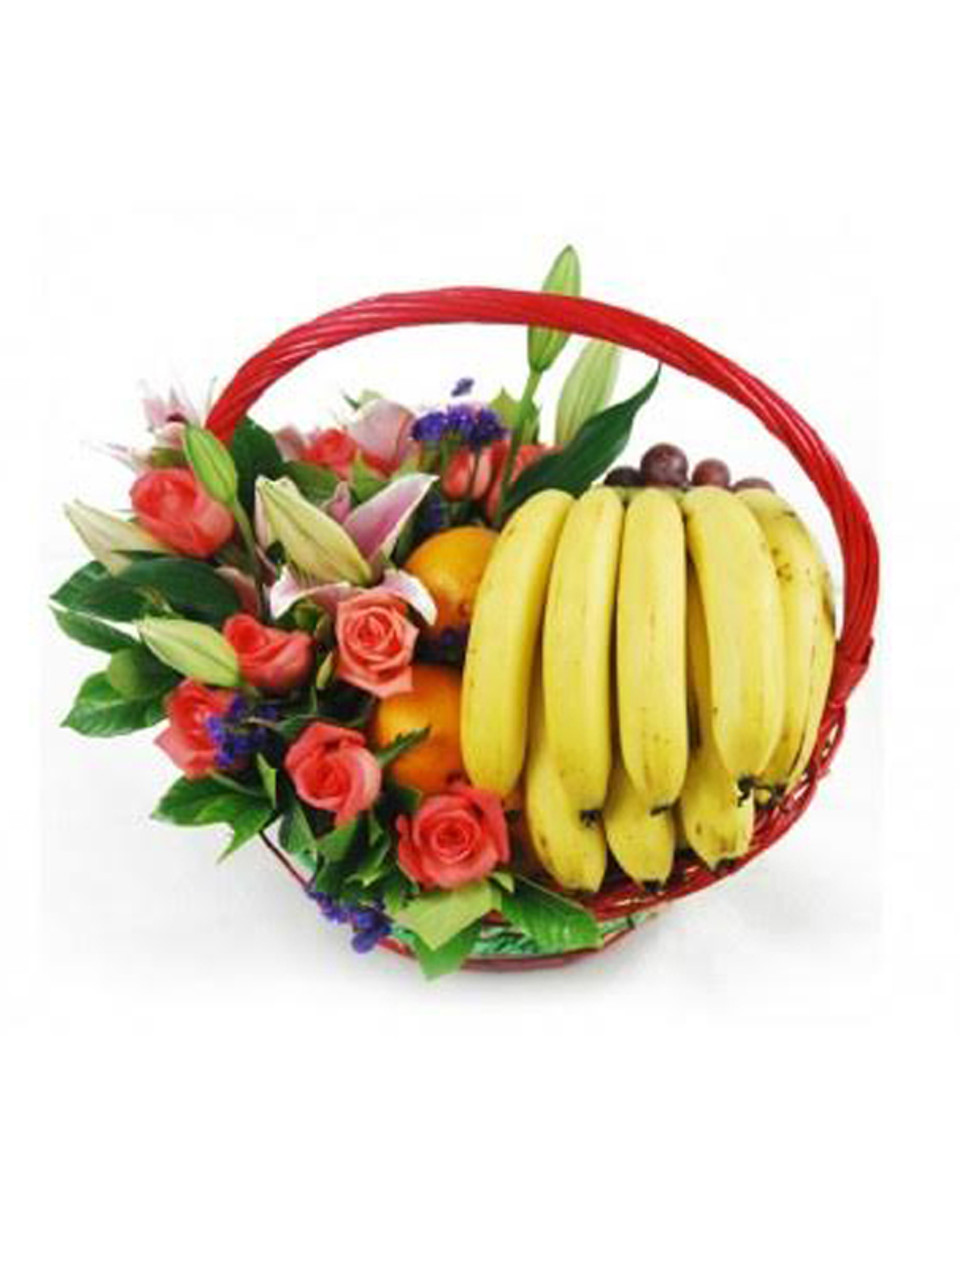 Pomelo Roses, Lilies & Fruit Basket